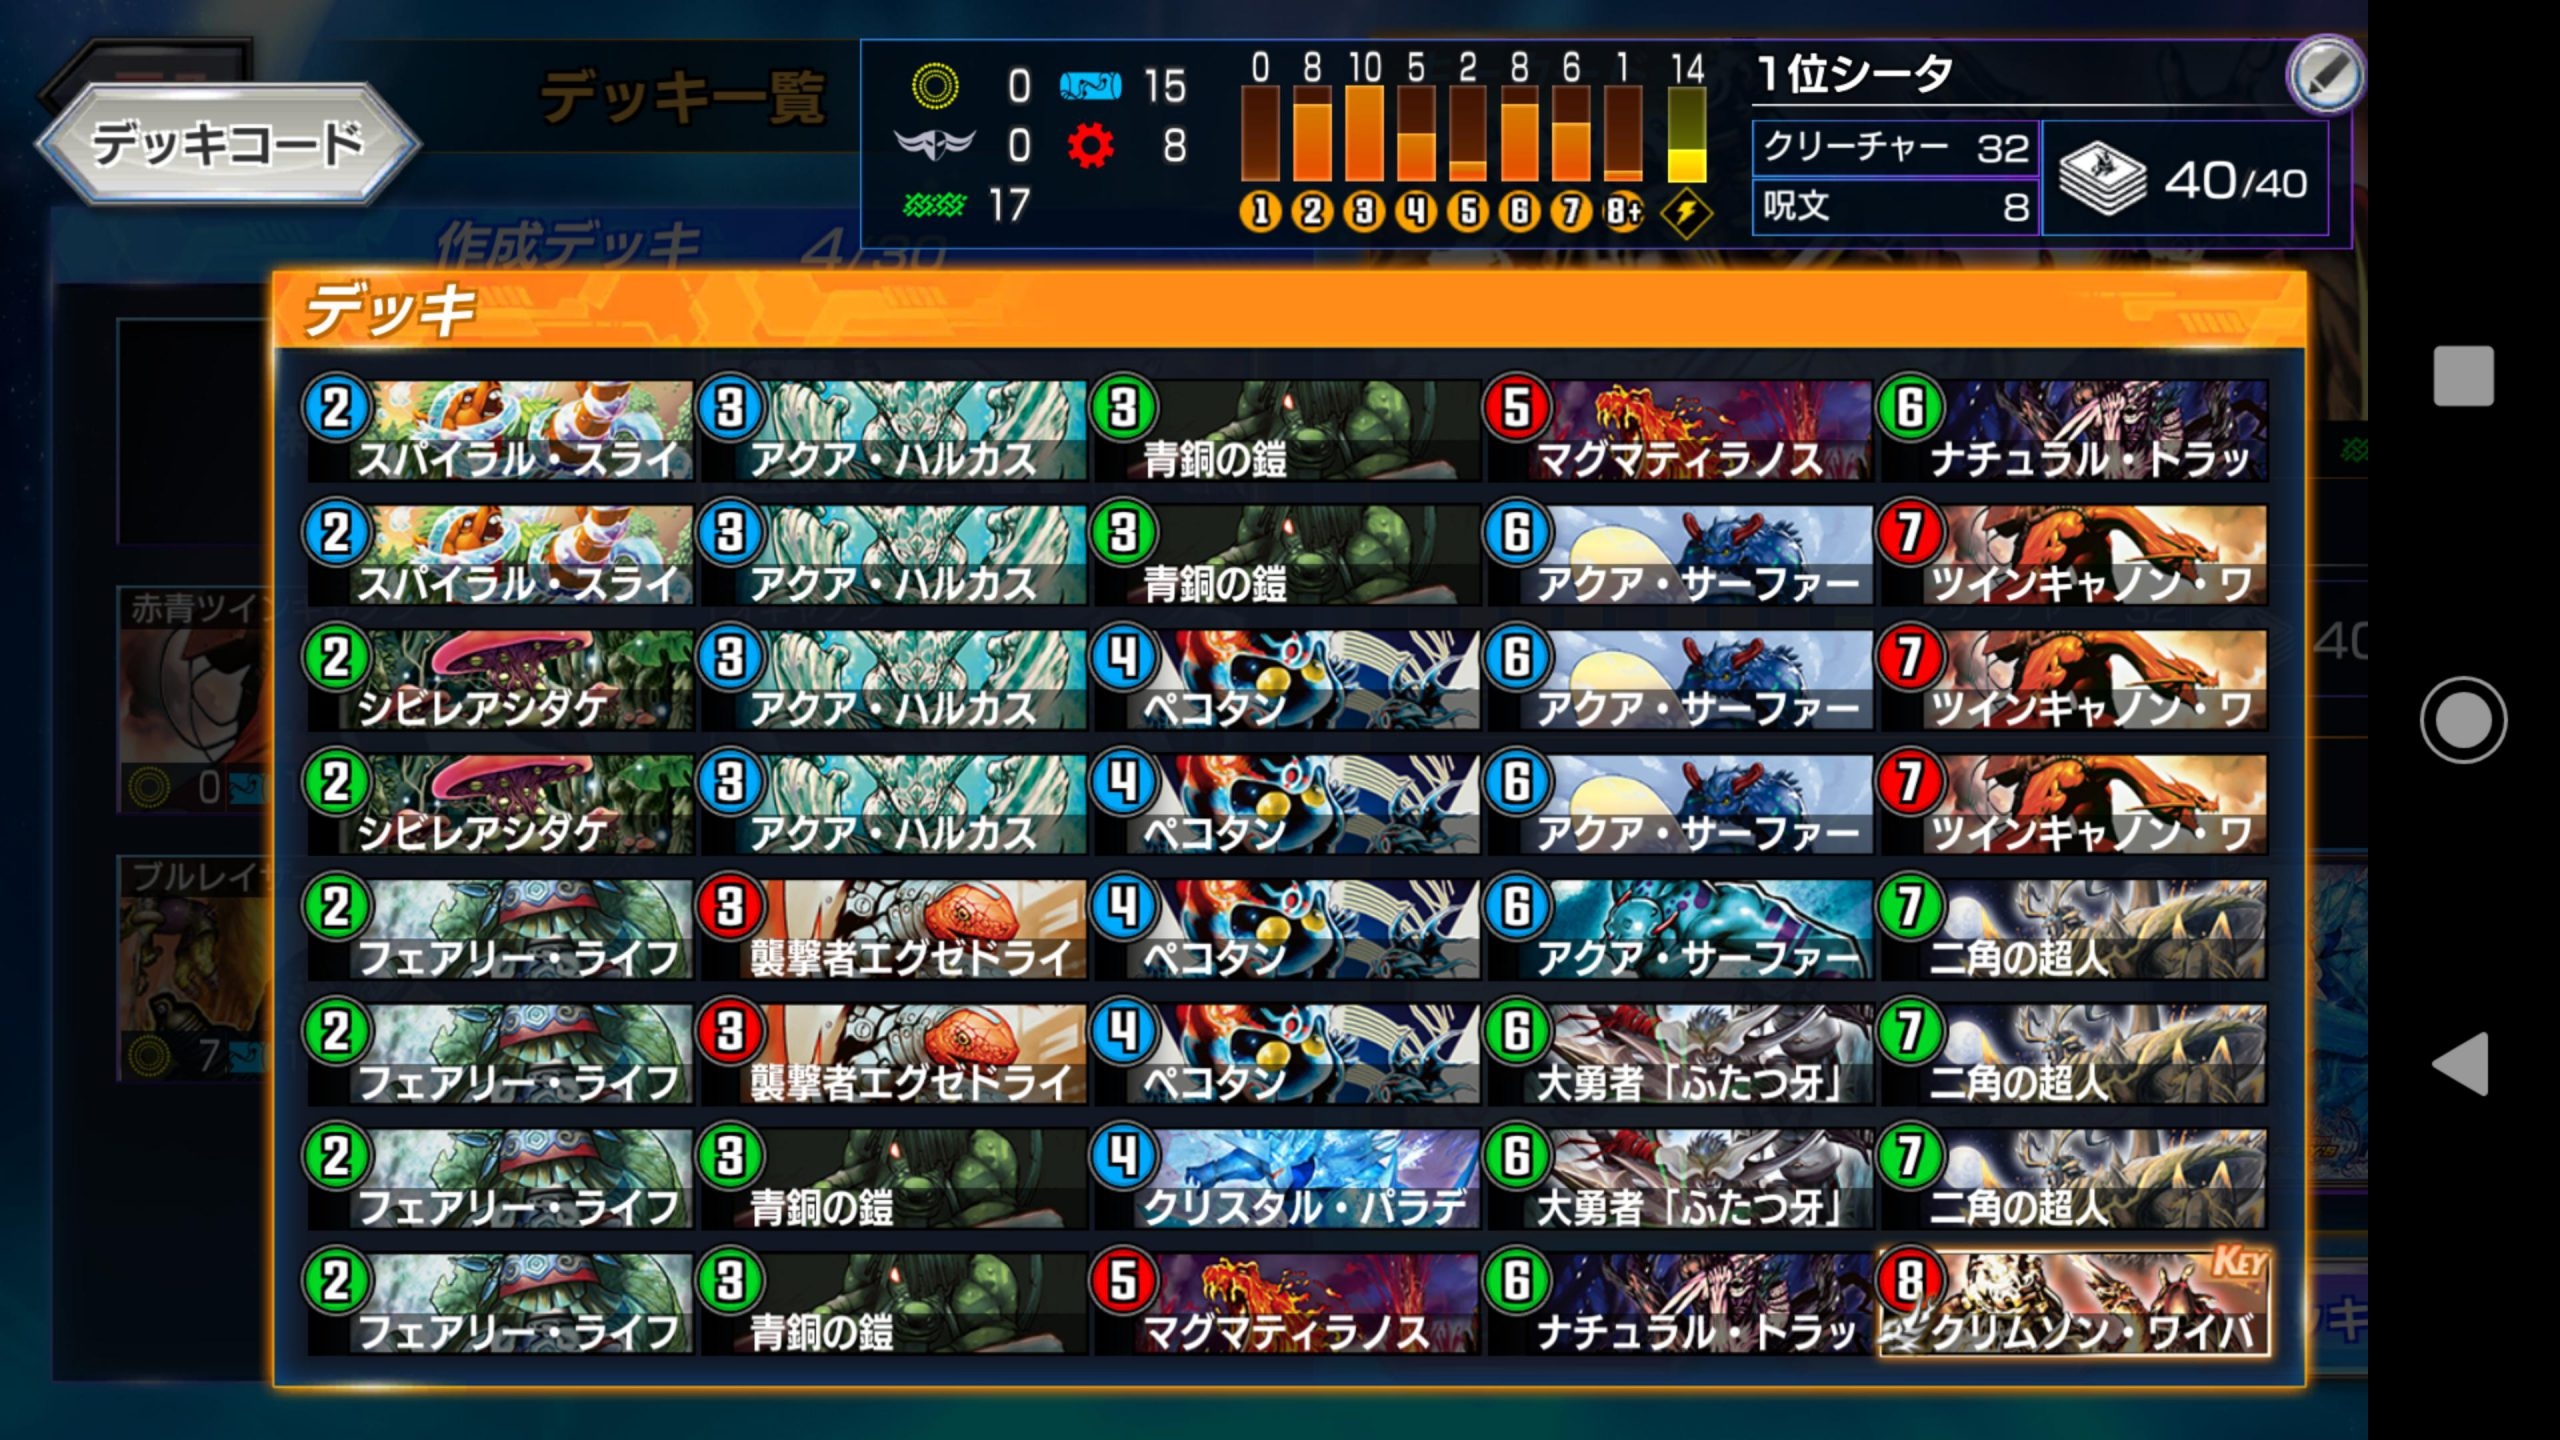 Dv8aVeG scaled - 【悲報】デュエマ、勝てない